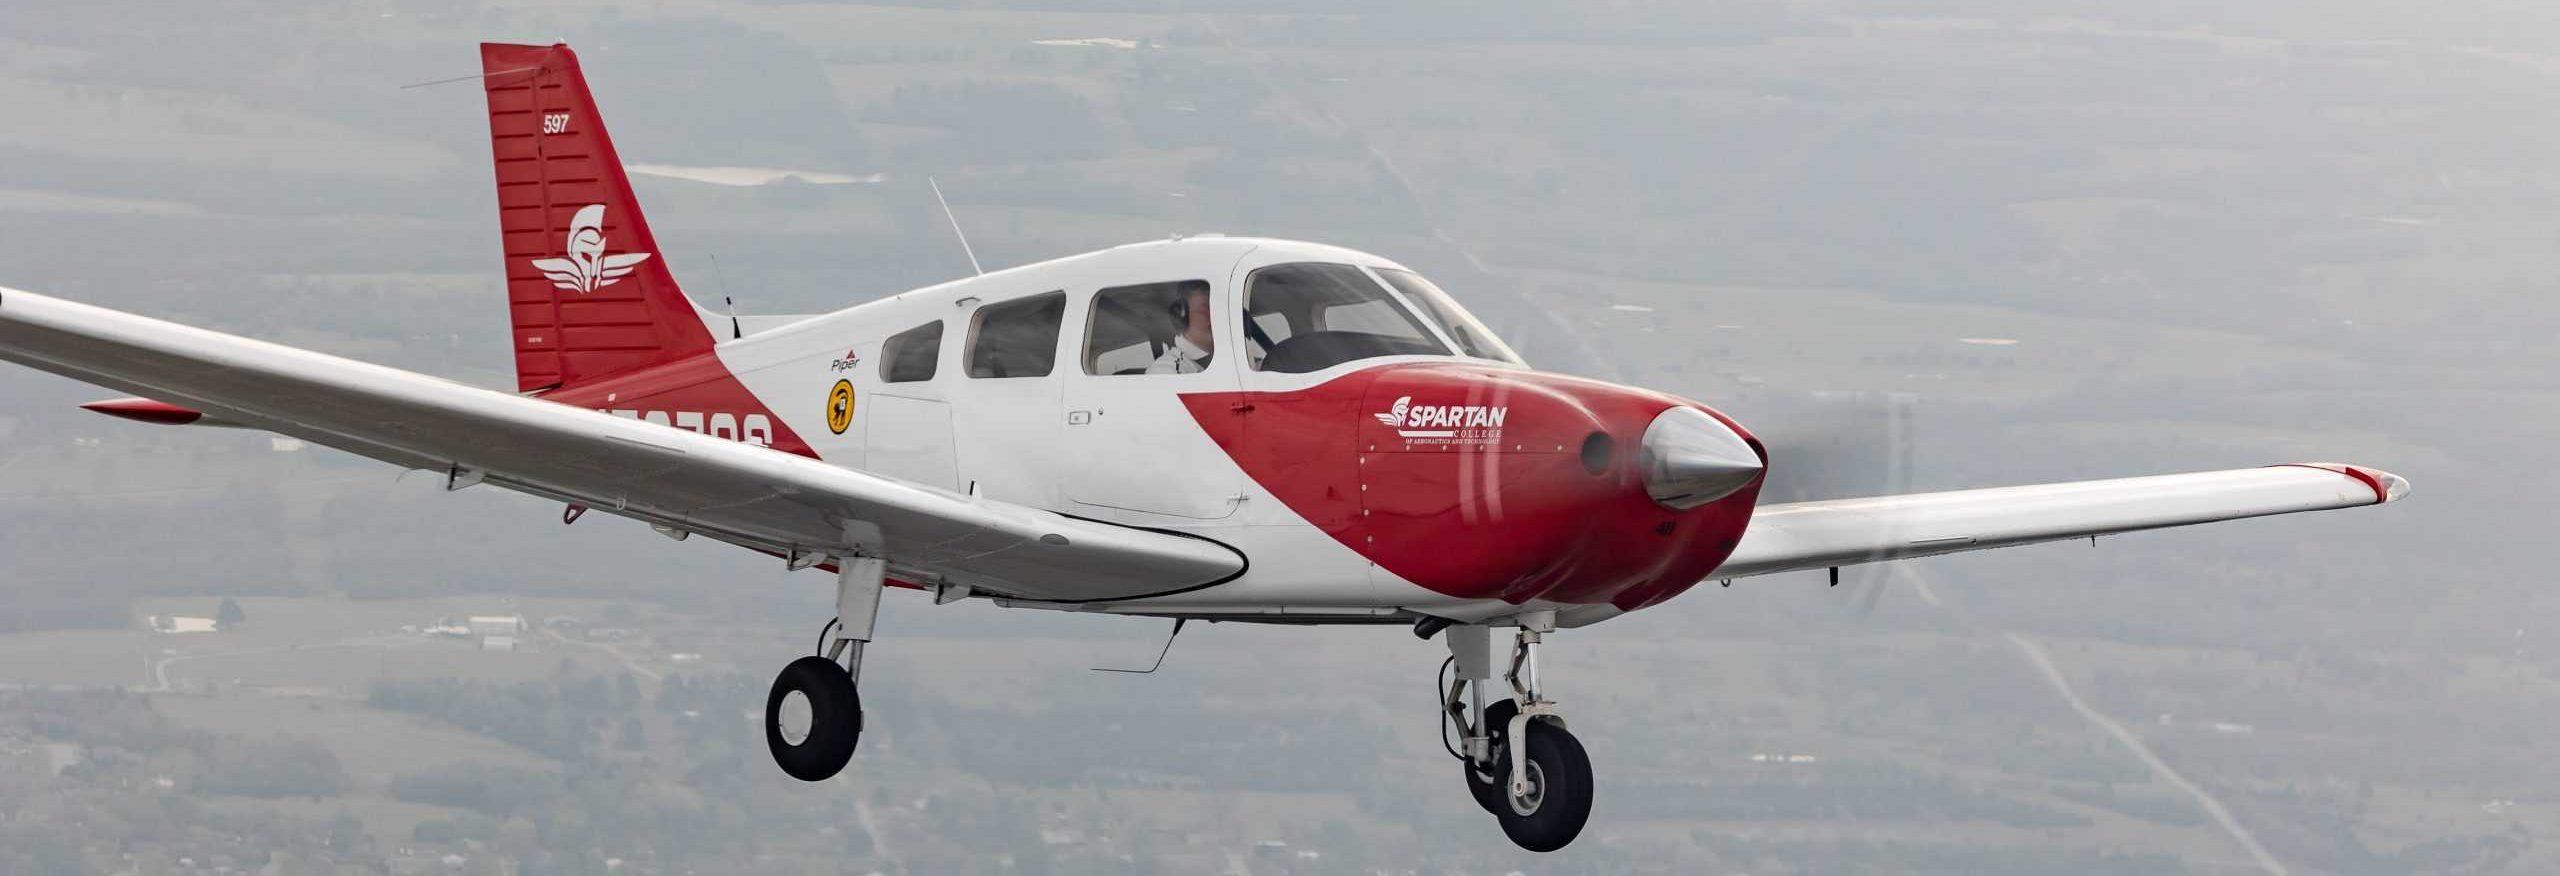 plane in flight spartan